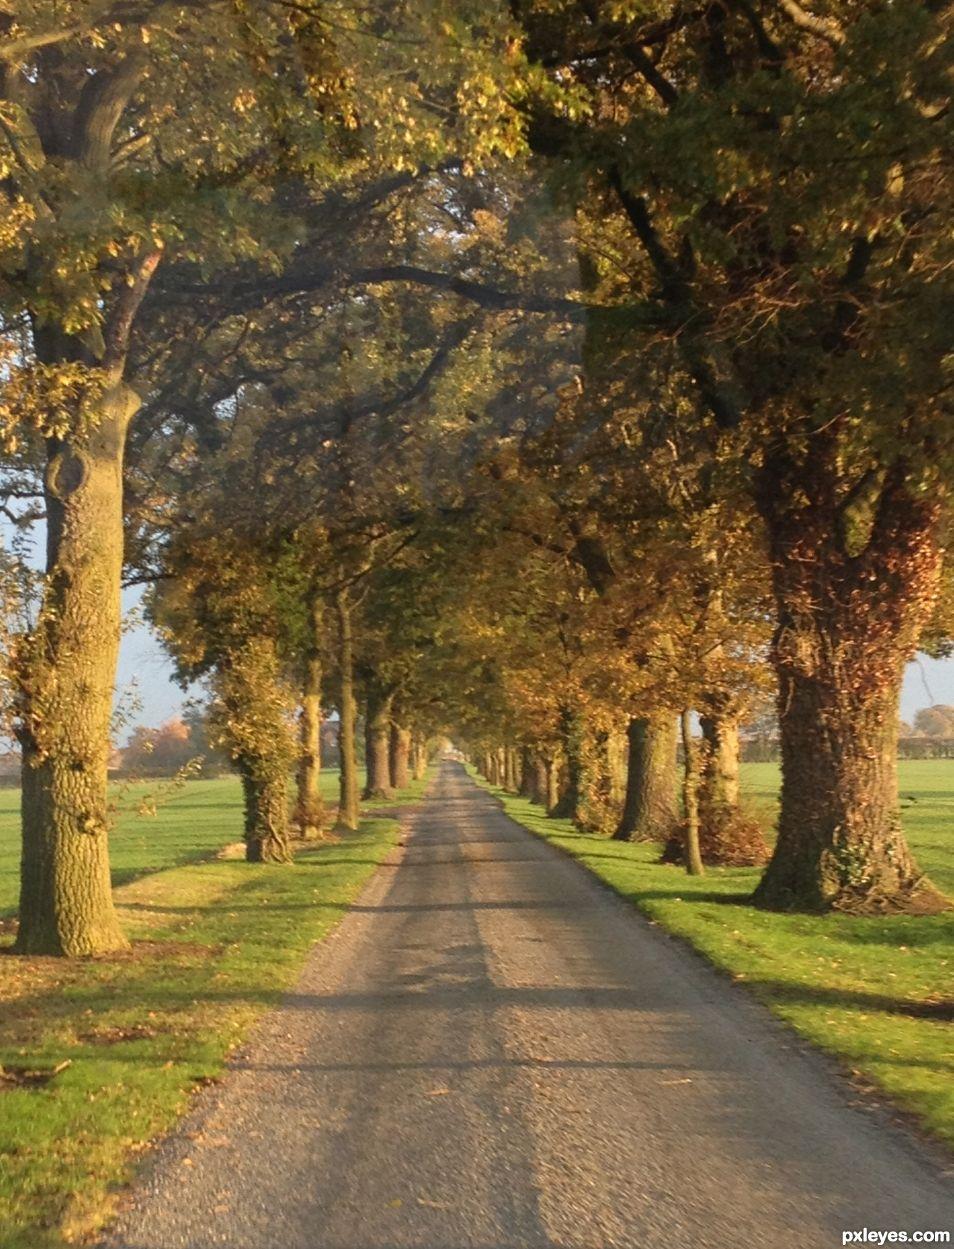 The Long Driveway